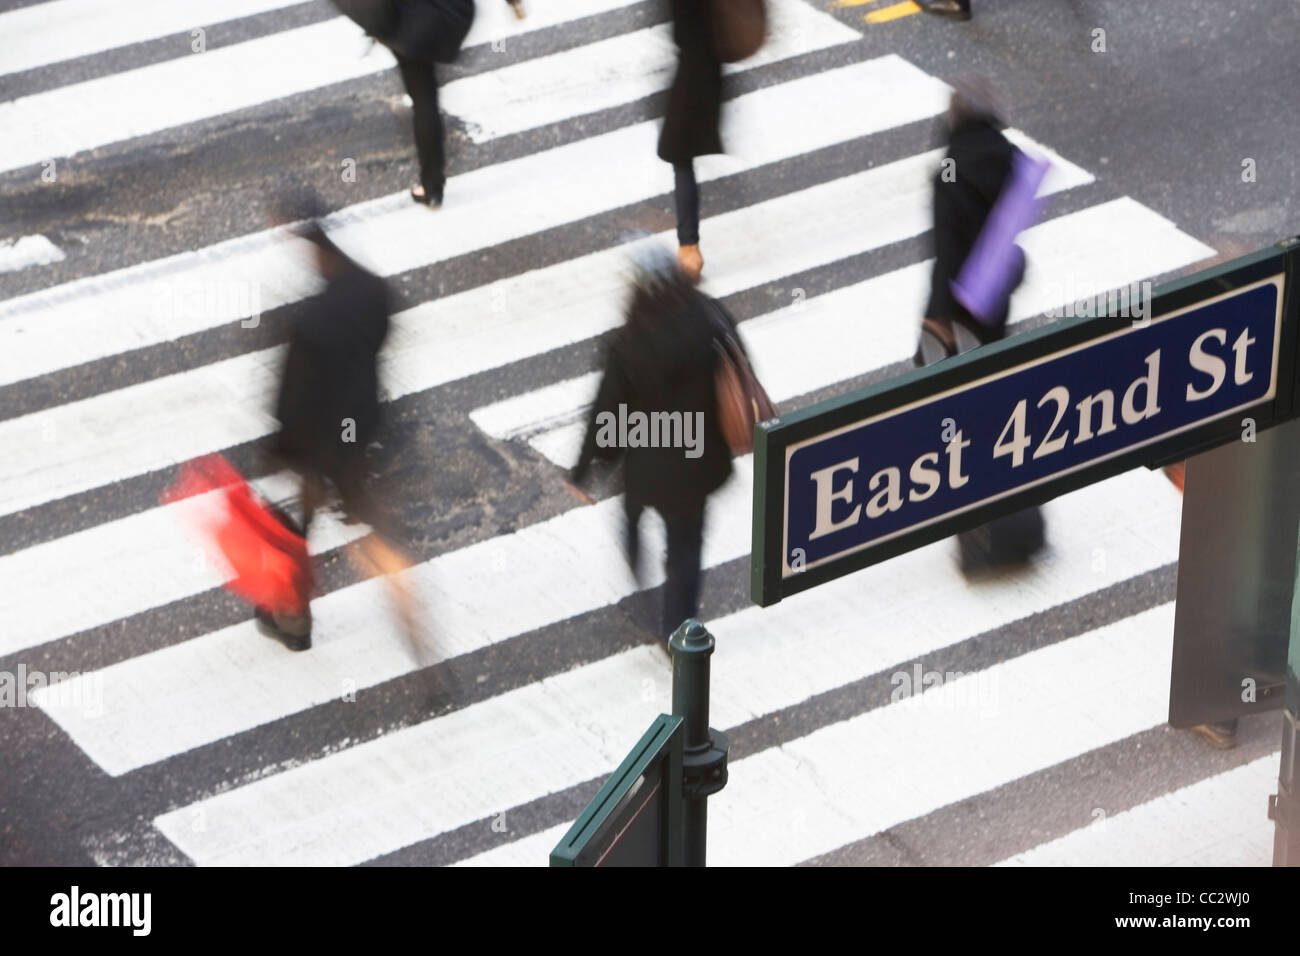 USA, New York City, Manhattan, 42nd street, Pedestrians on zebra crossing - Stock Image